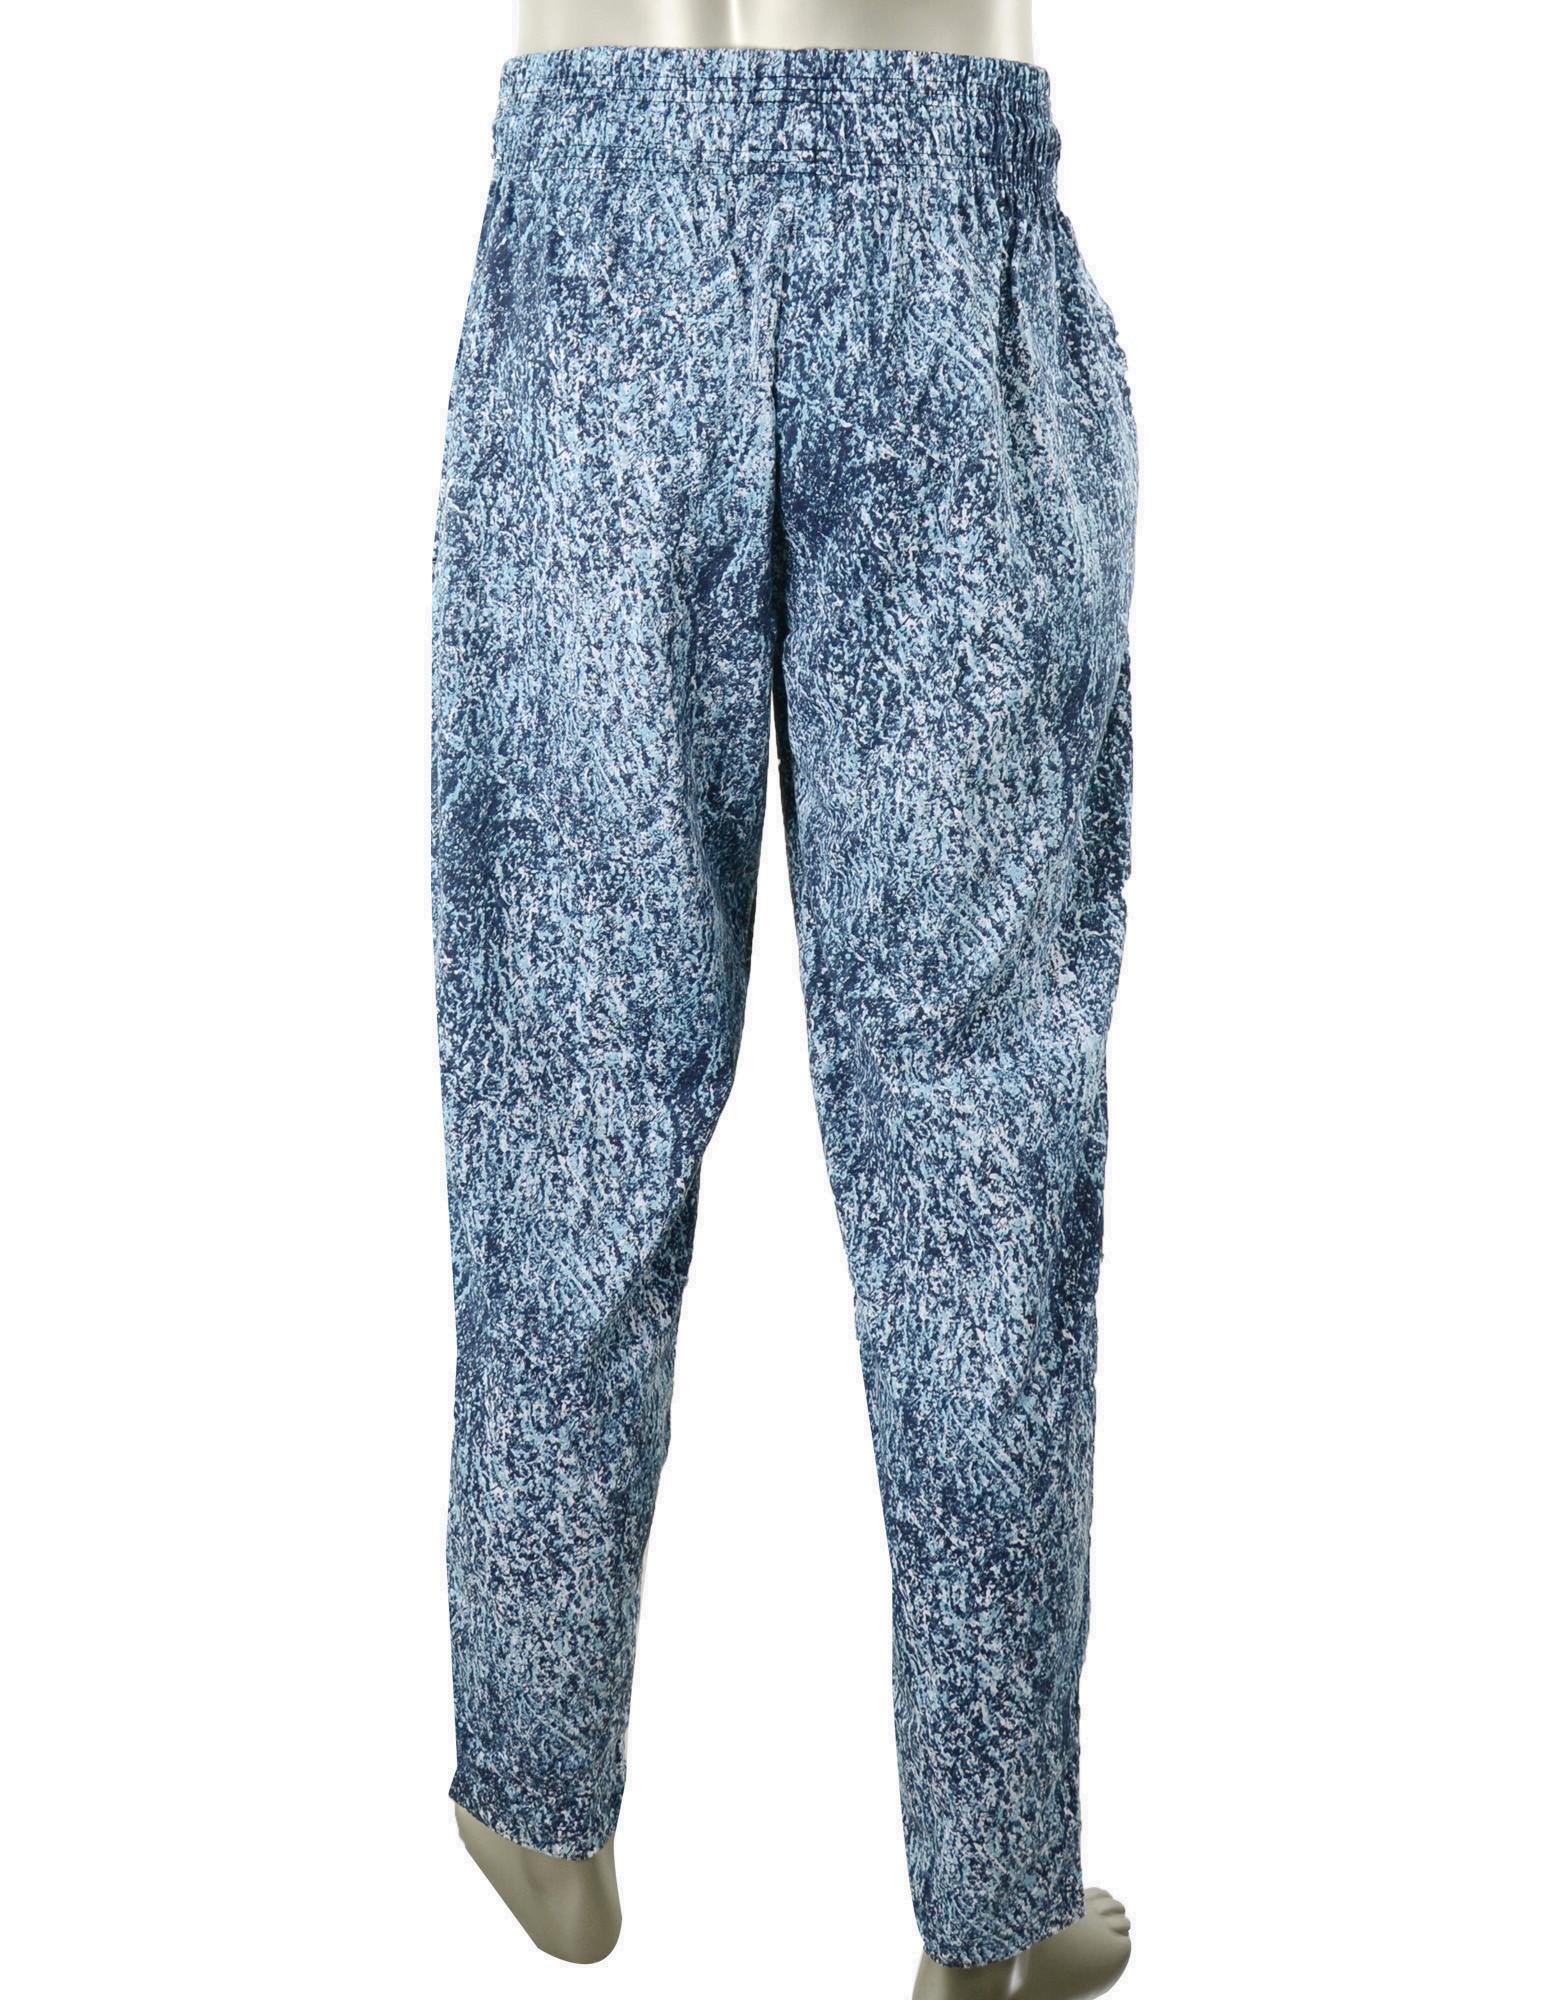 500 Baggie Pant By Otomix Colour Blue Stonewash 45 21